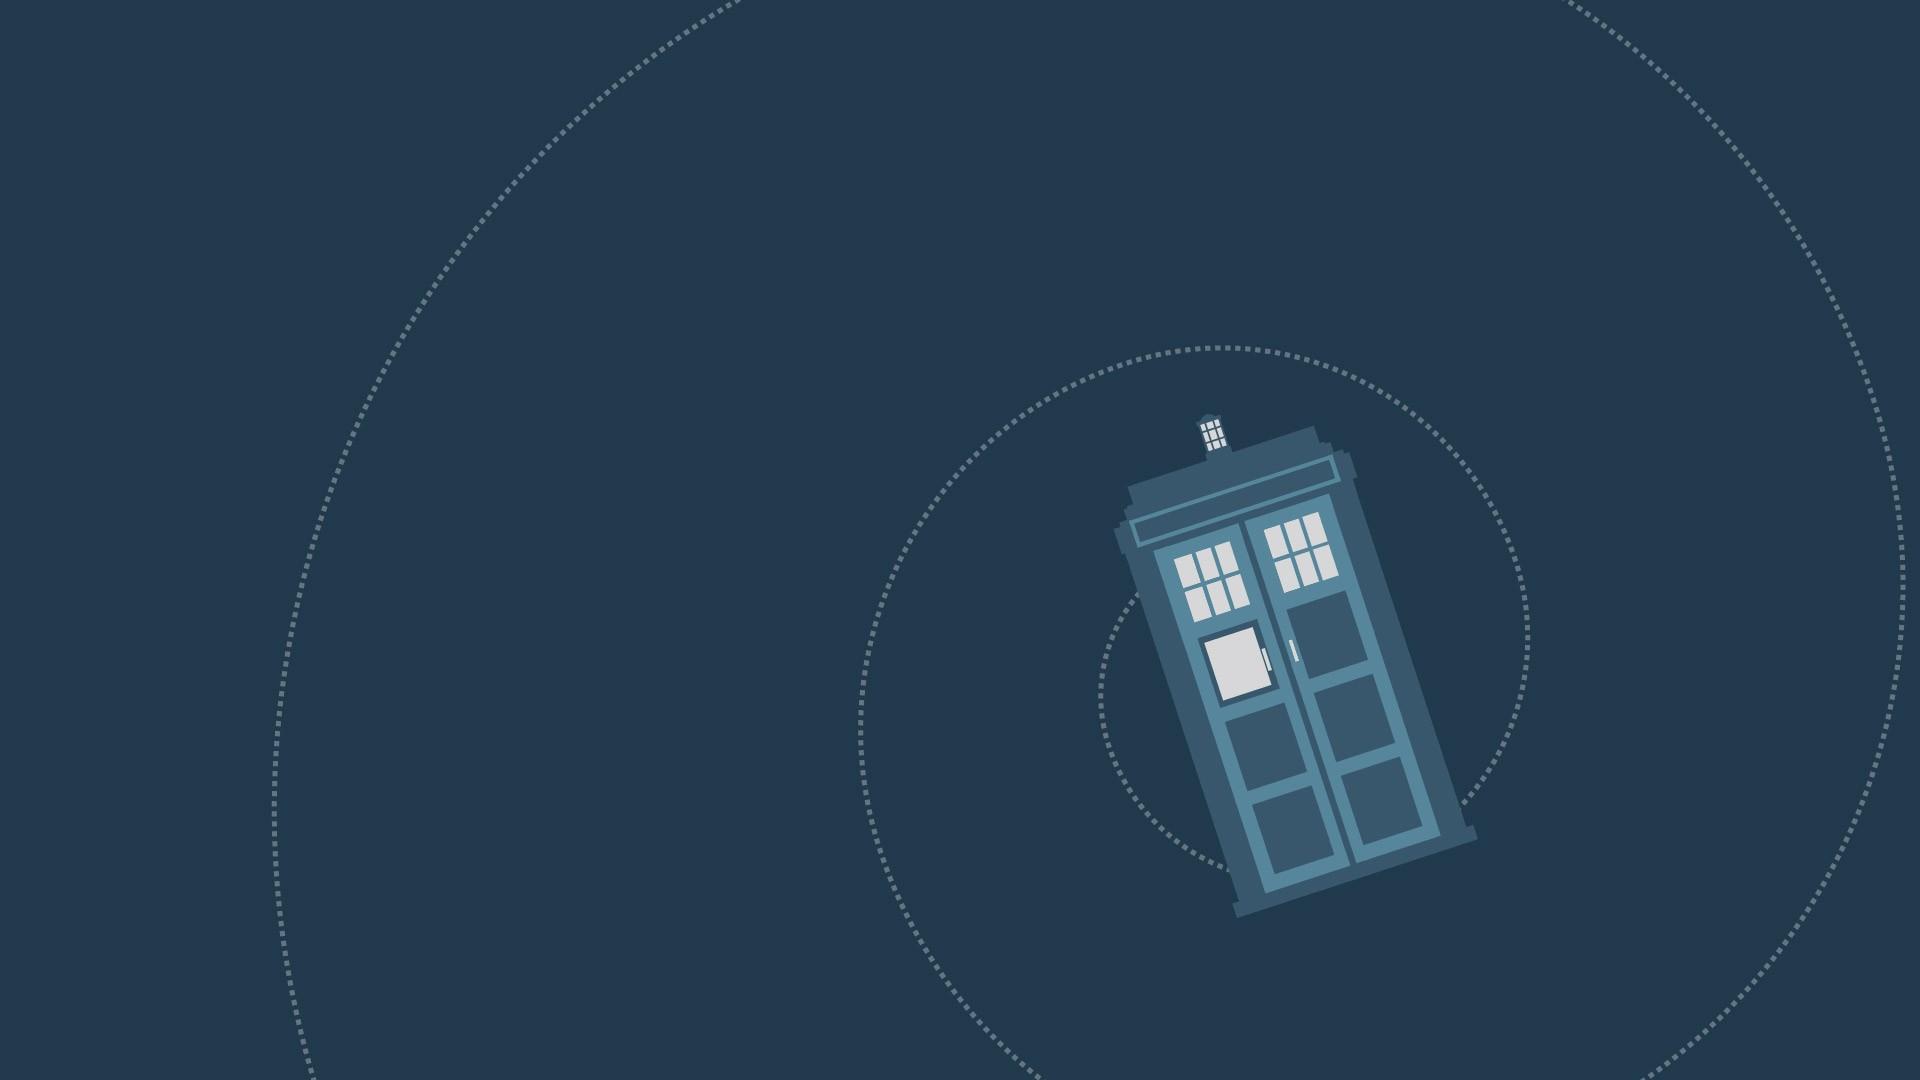 Wallpaper 1920x1080 Px Doctor Who Tardis 1920x1080